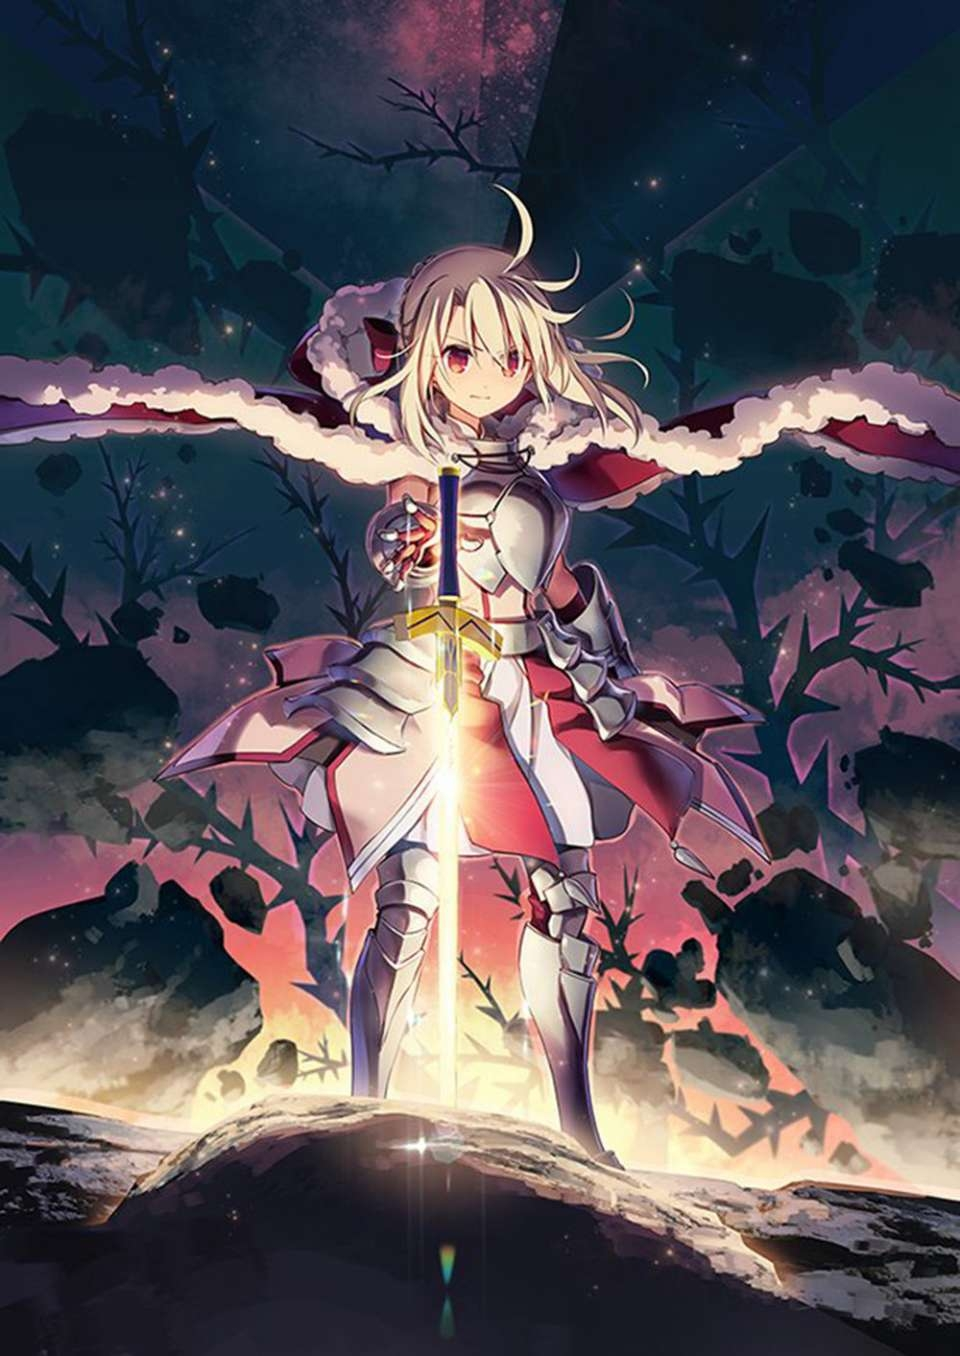 Fate/kaleid liner Prisma Illya anime får ny anime film